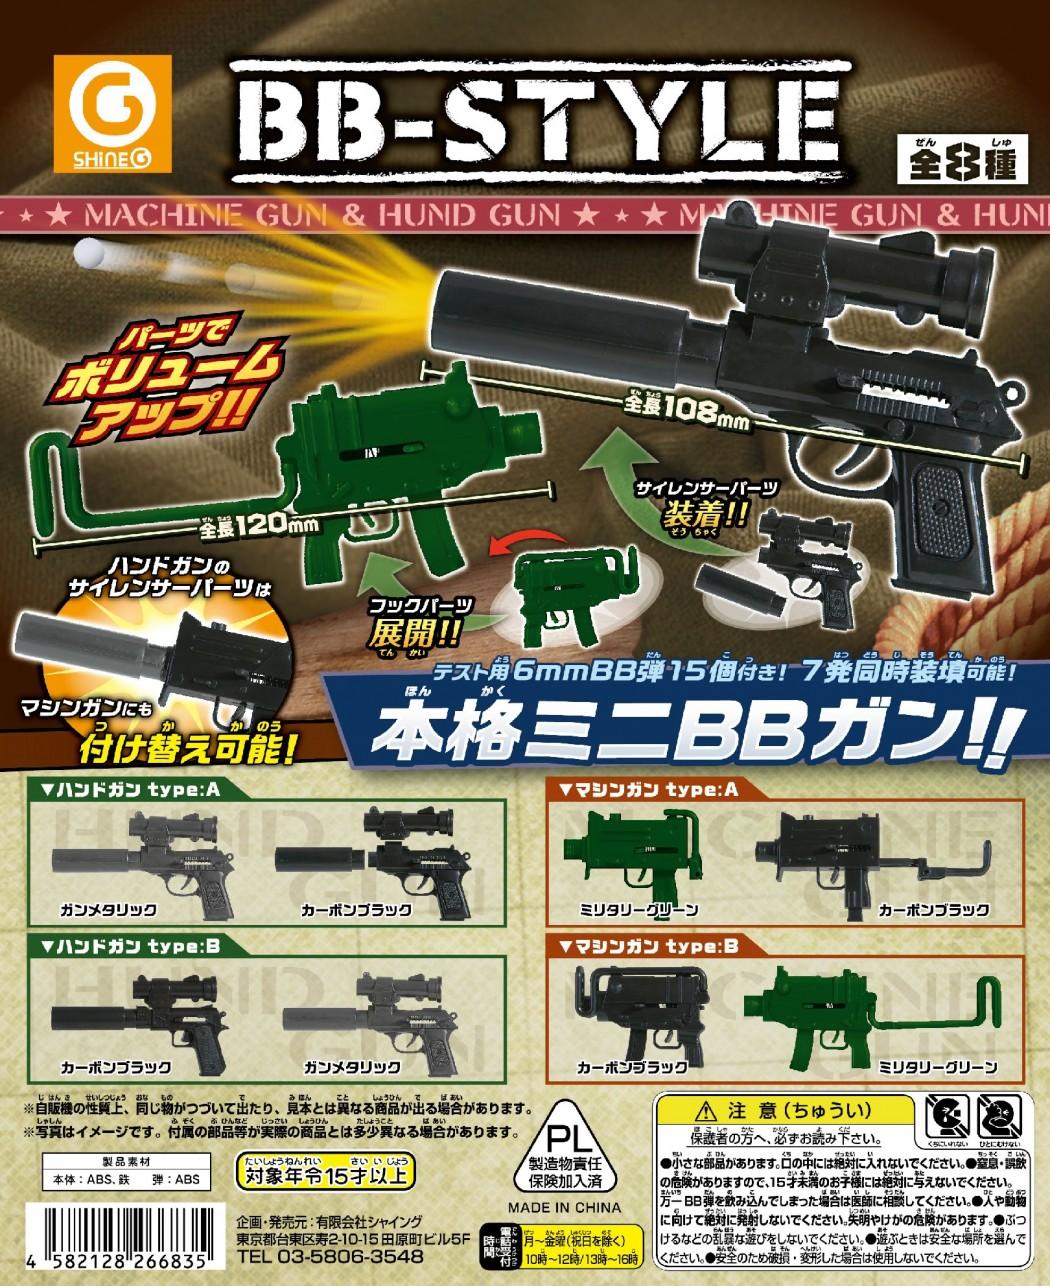 BB-STYLE